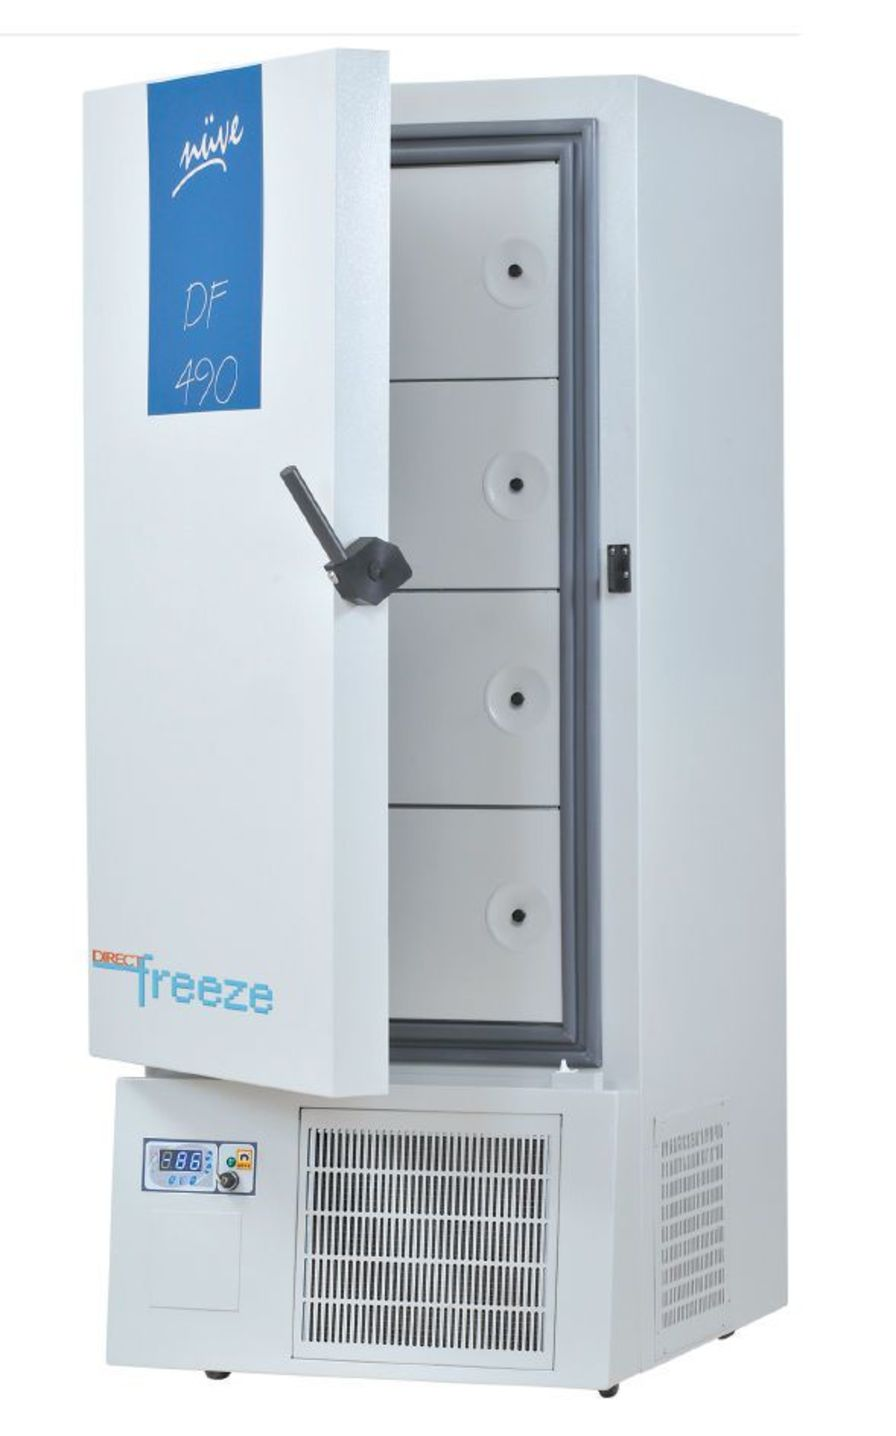 Laboratory freezer / upright / ultralow-temperature / 1-door -86 °C, 455 L | DF 490 Nüve